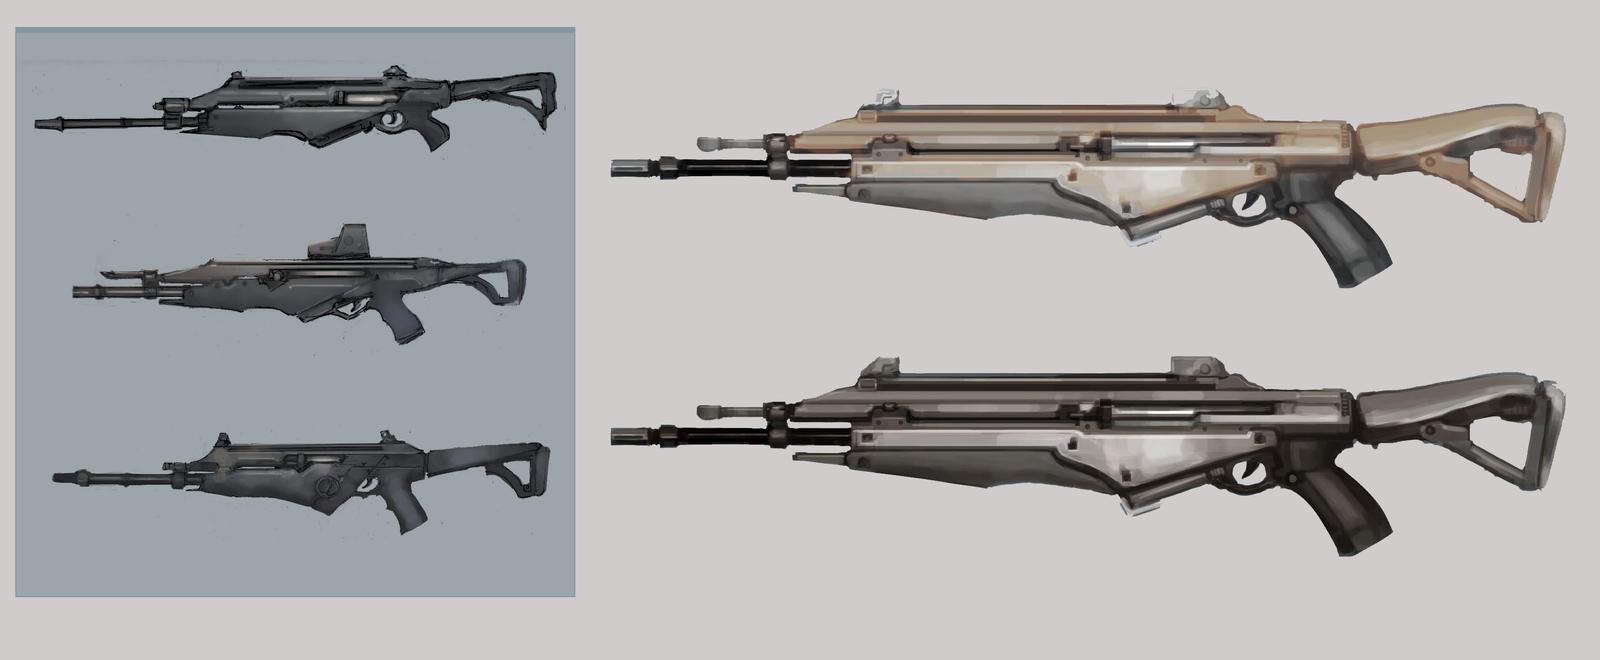 Weapon Sheet 1 by ModalMechanica